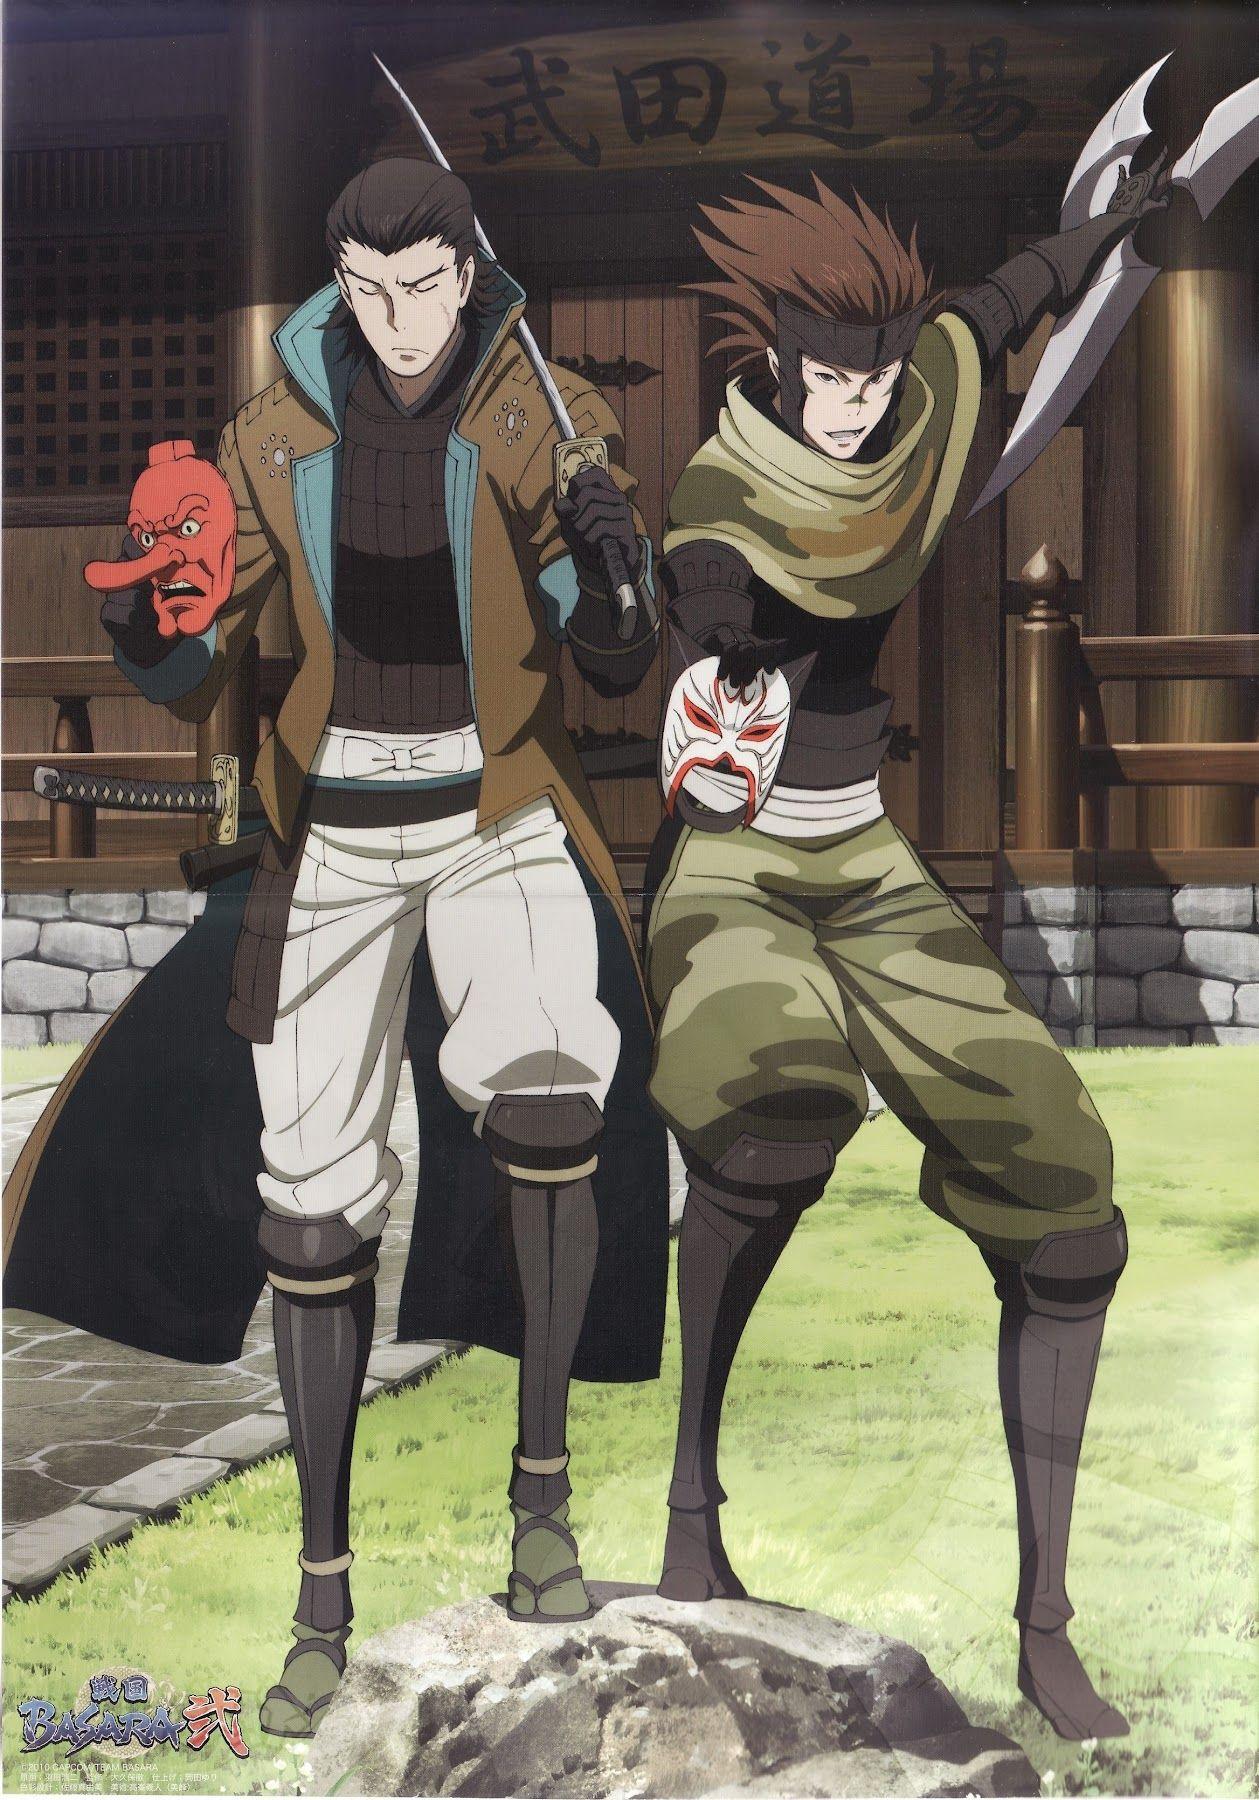 Sasuke and Katakura, Sengoku Basara 片倉小十郎, 戦国 バサラ